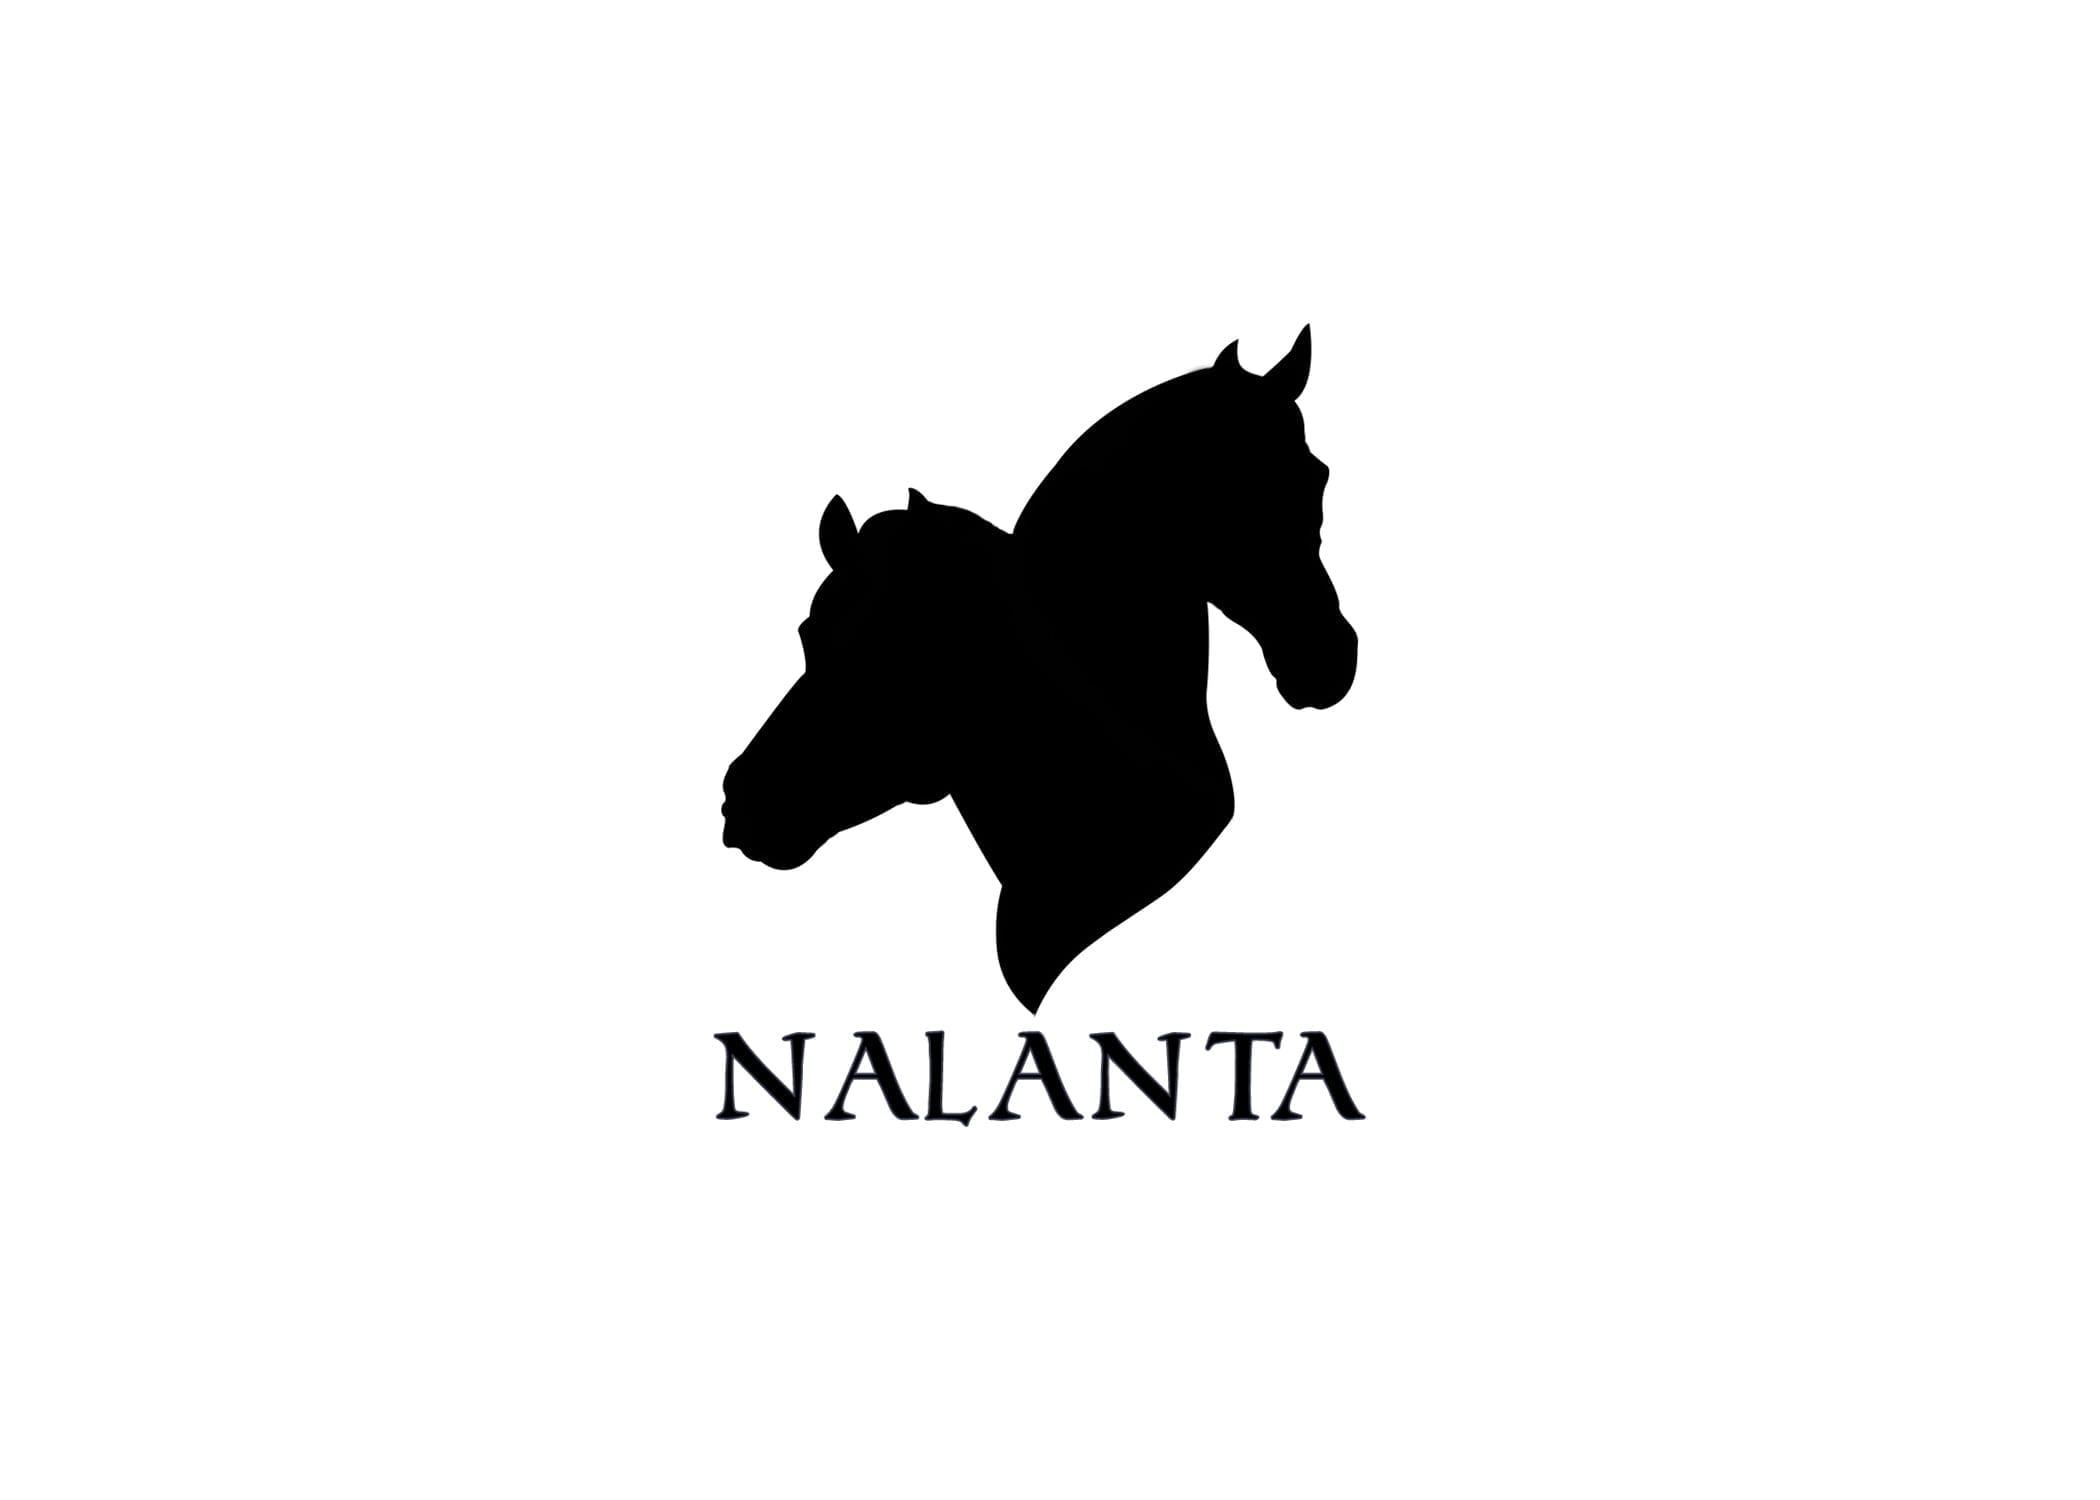 NALANTA SET